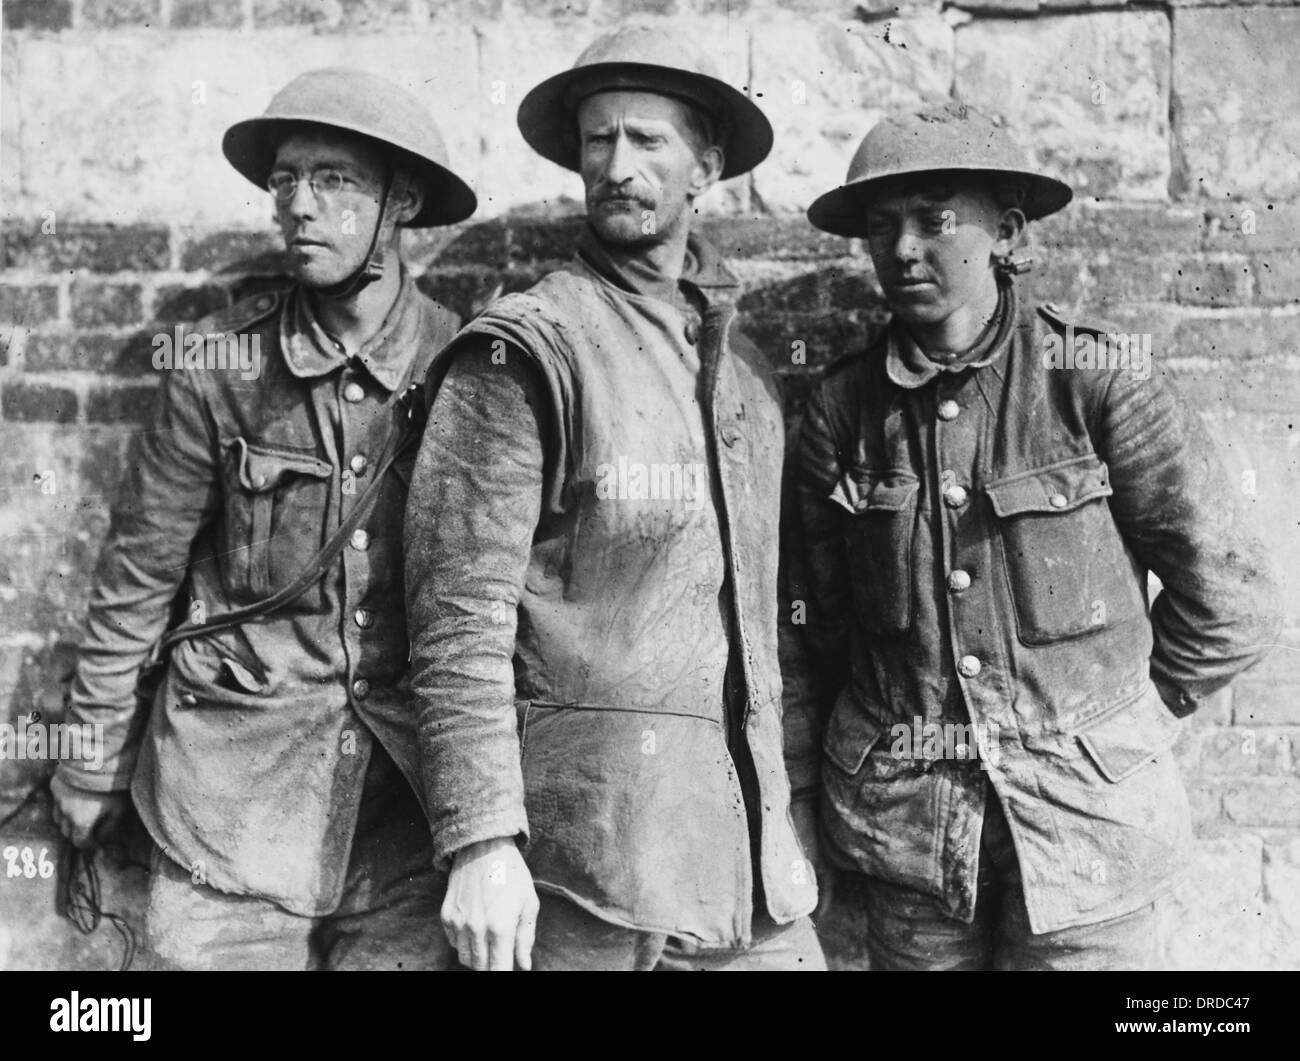 British prisoners WWI - Stock Image